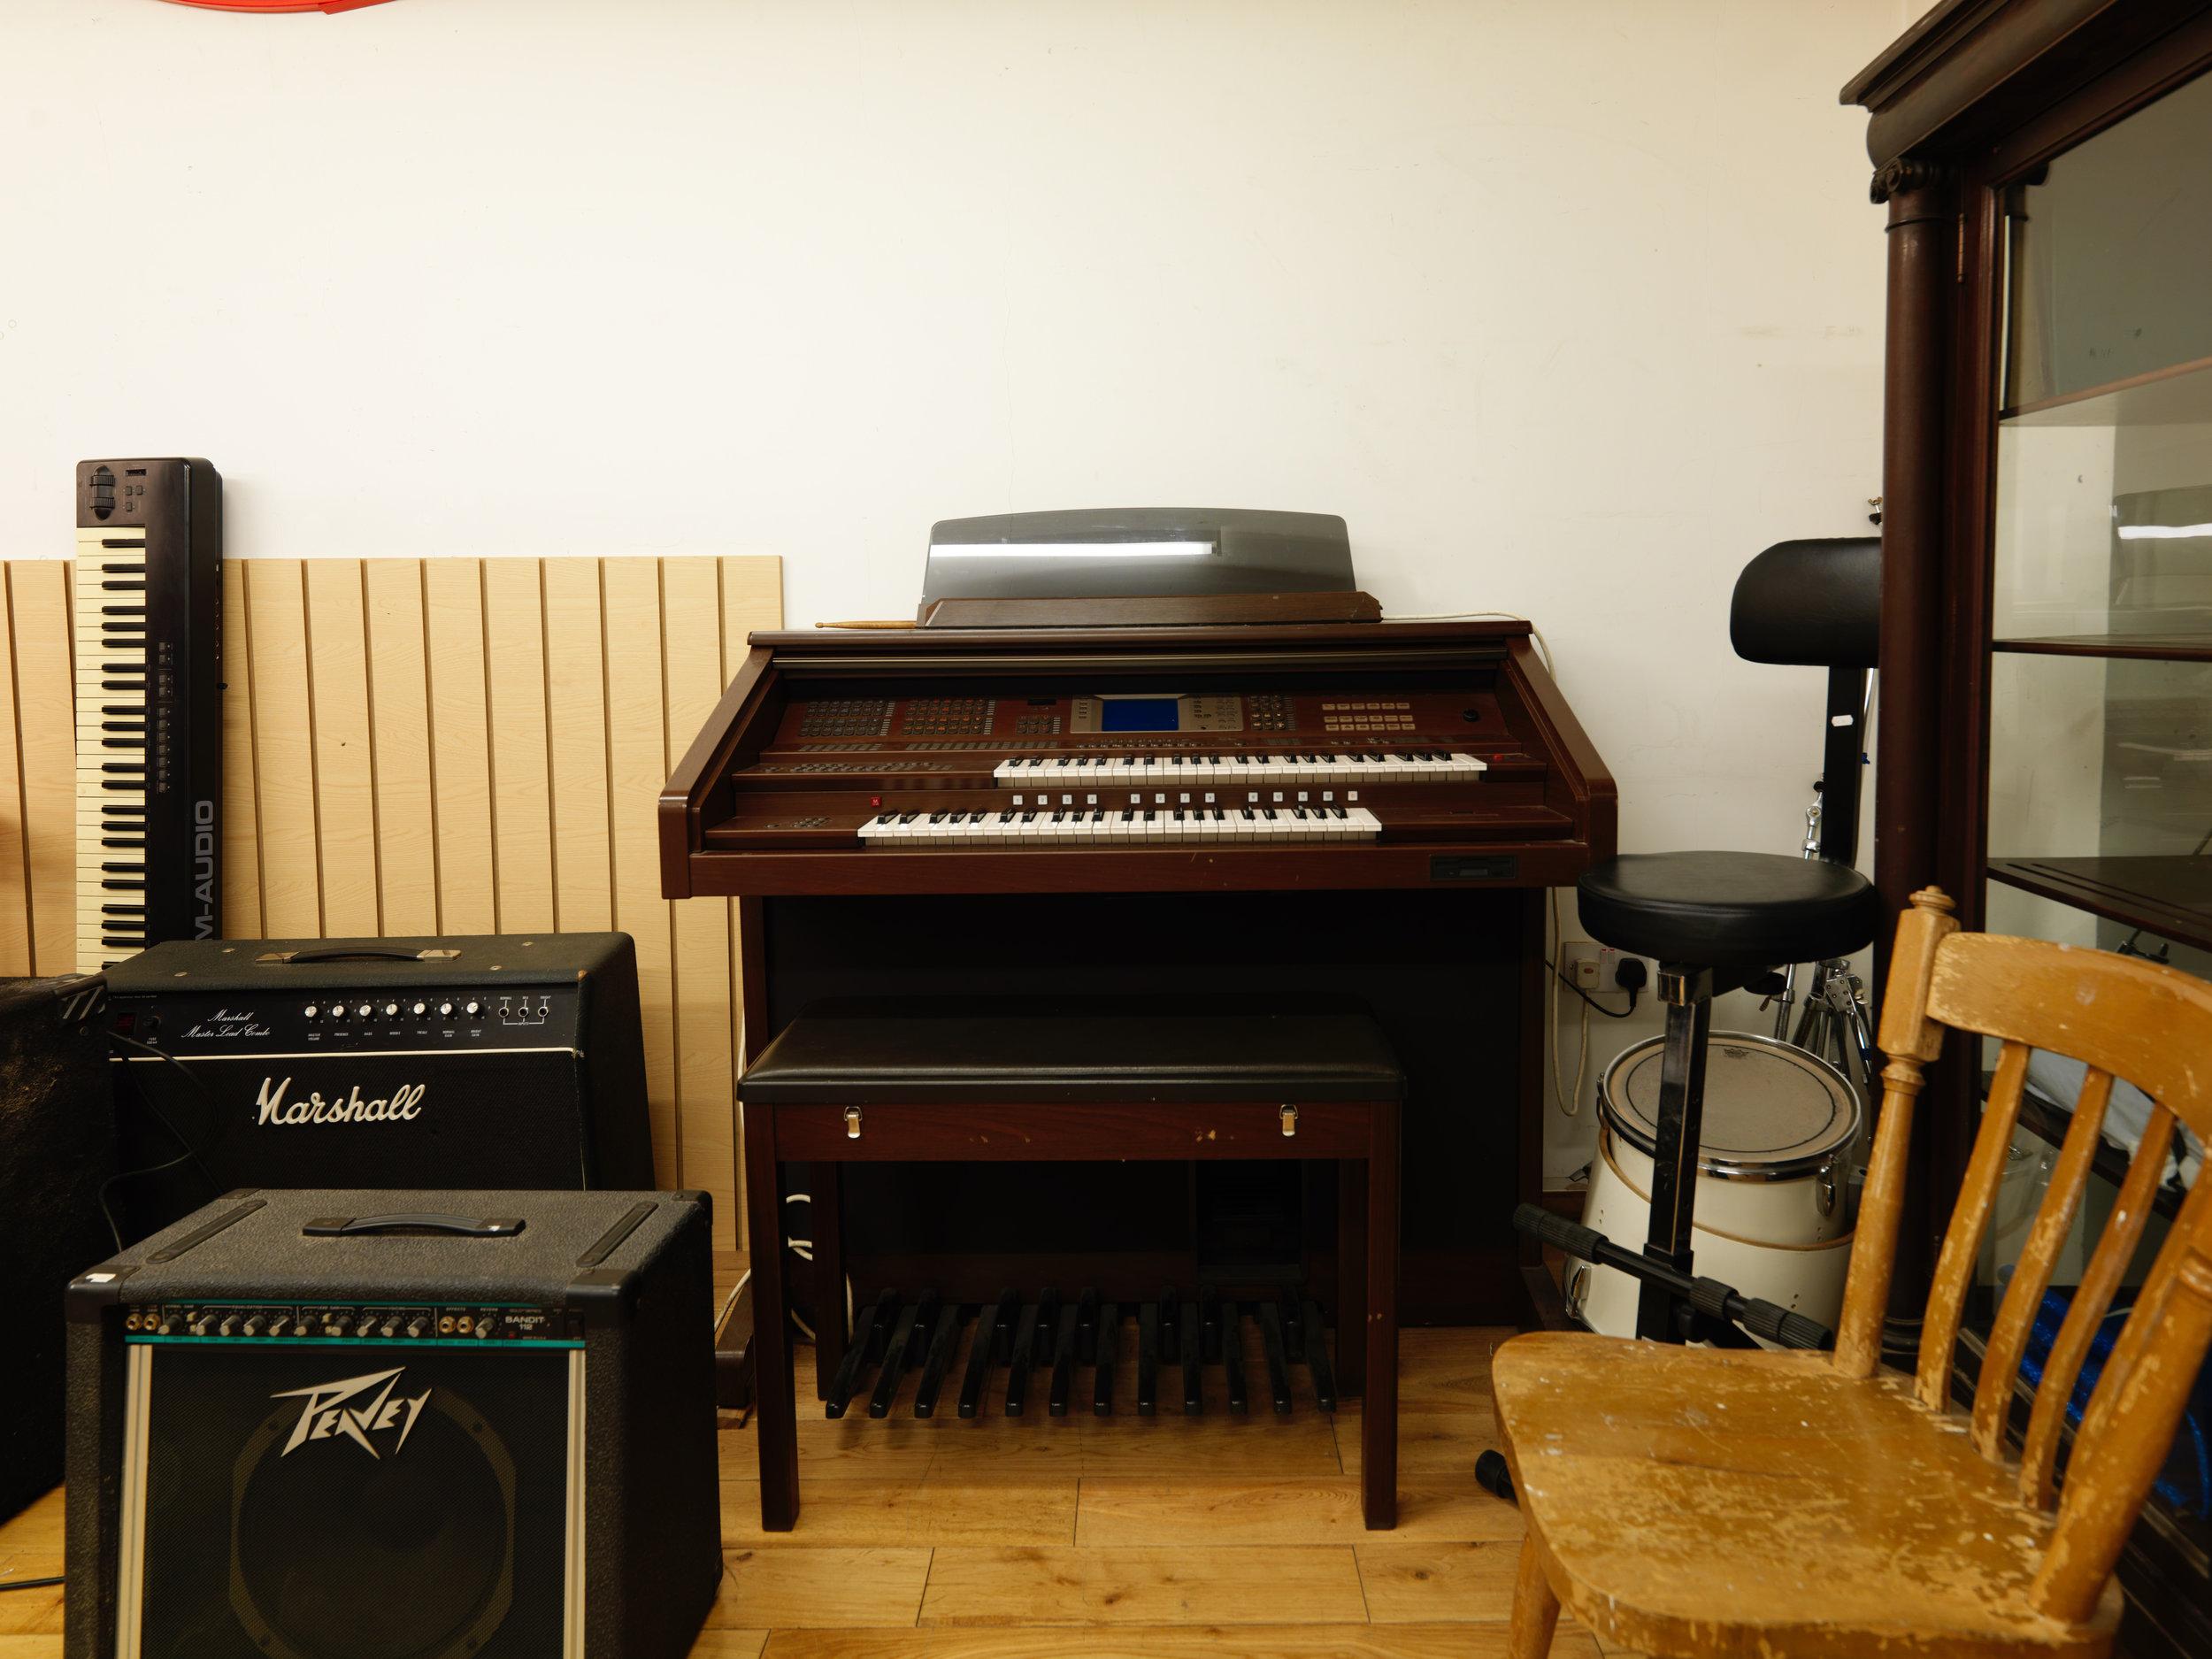 Folkies Music's spacious basement